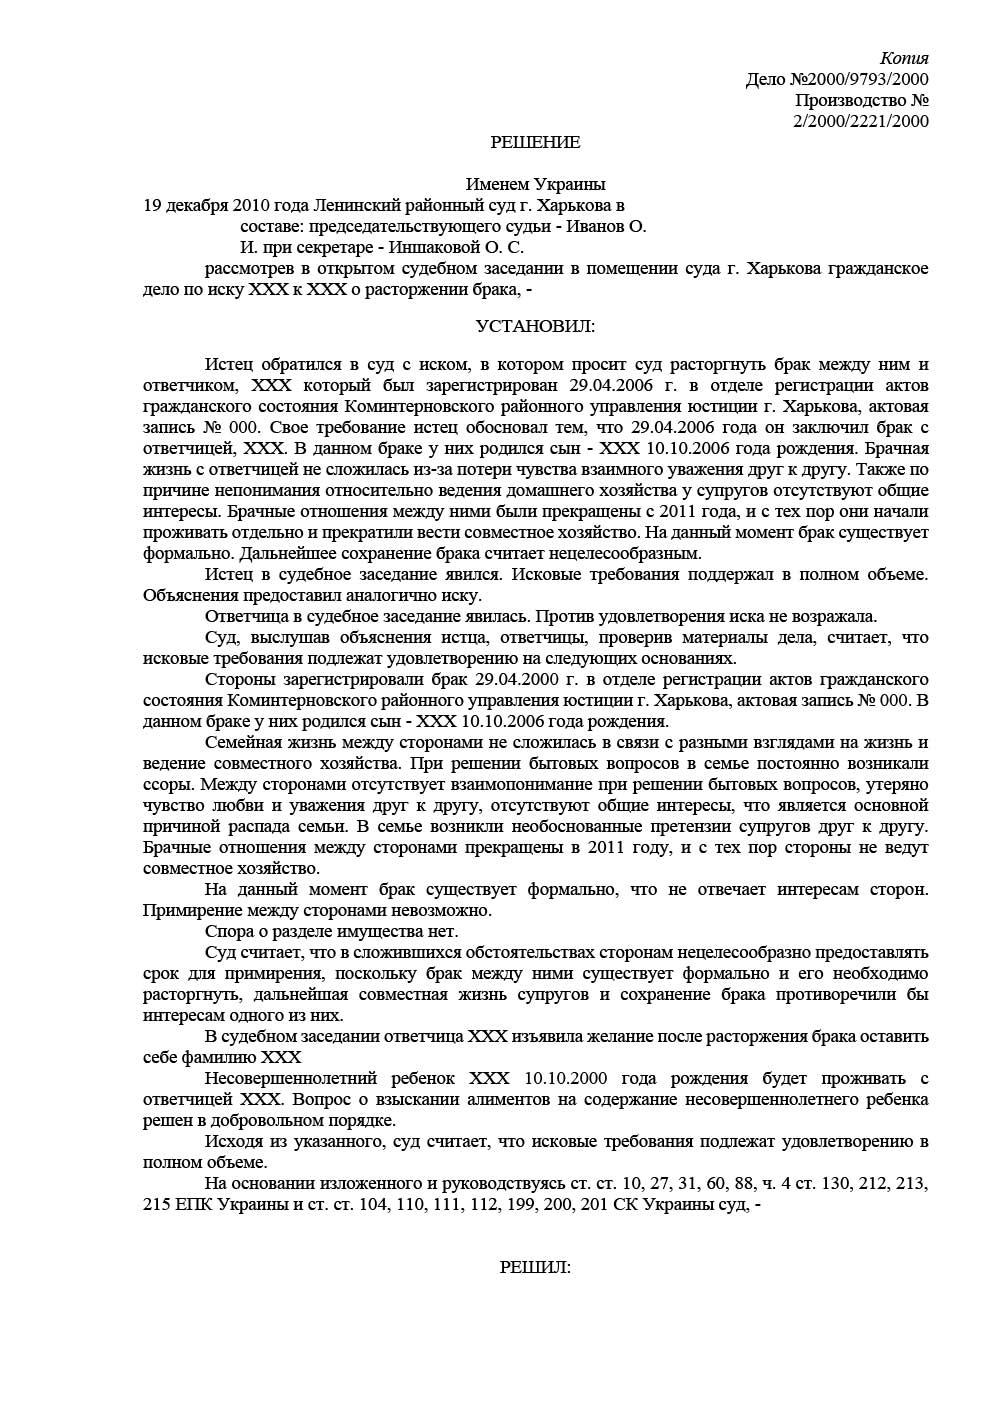 Пример перевода решениясуда с укранинского